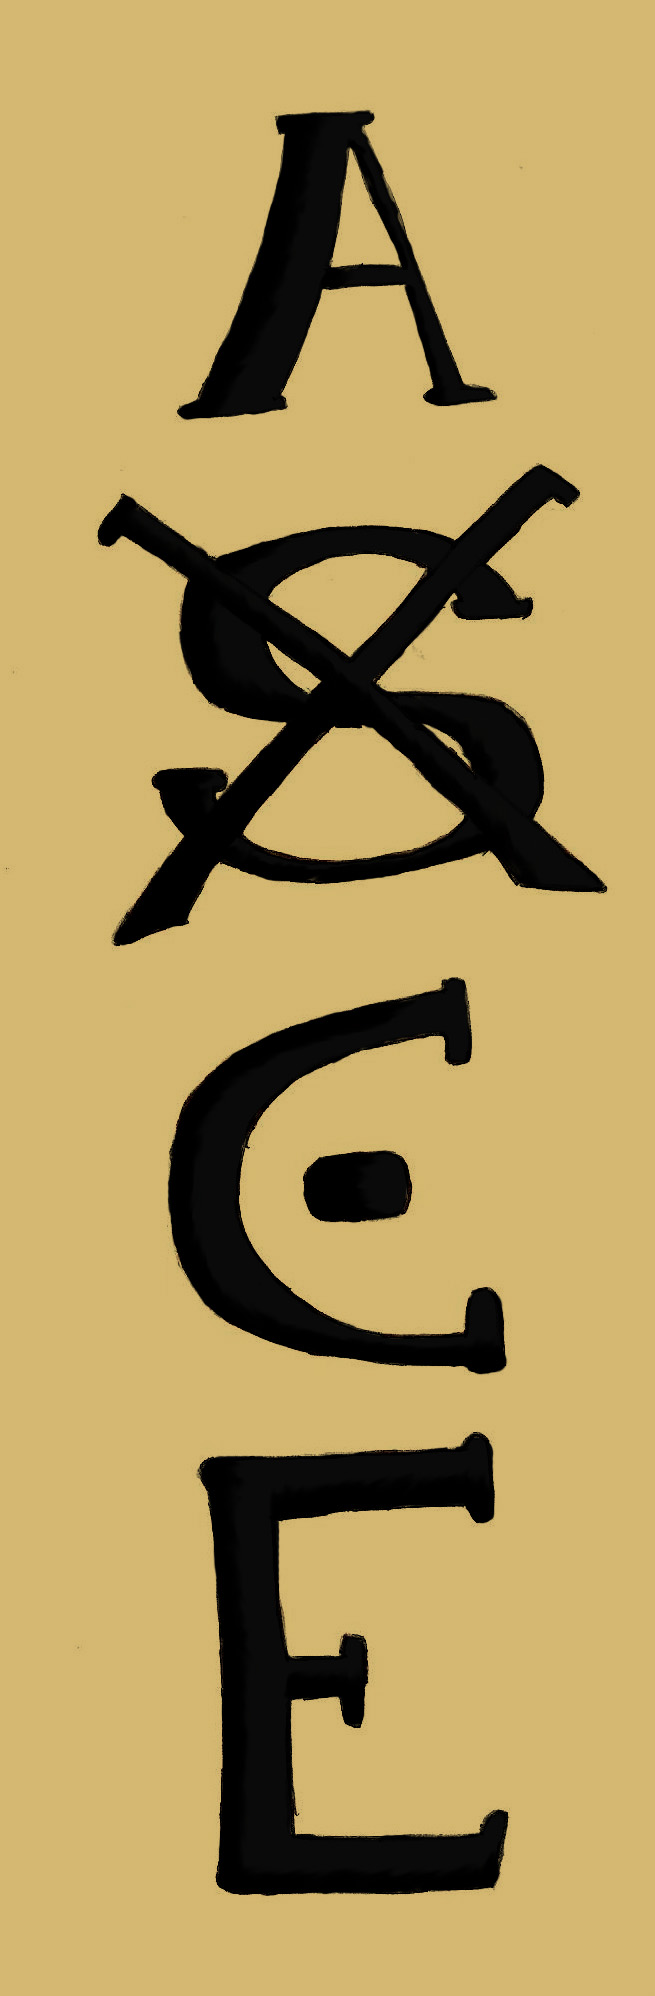 asce_tattoo_by_avanura-d3idzoy.jpg